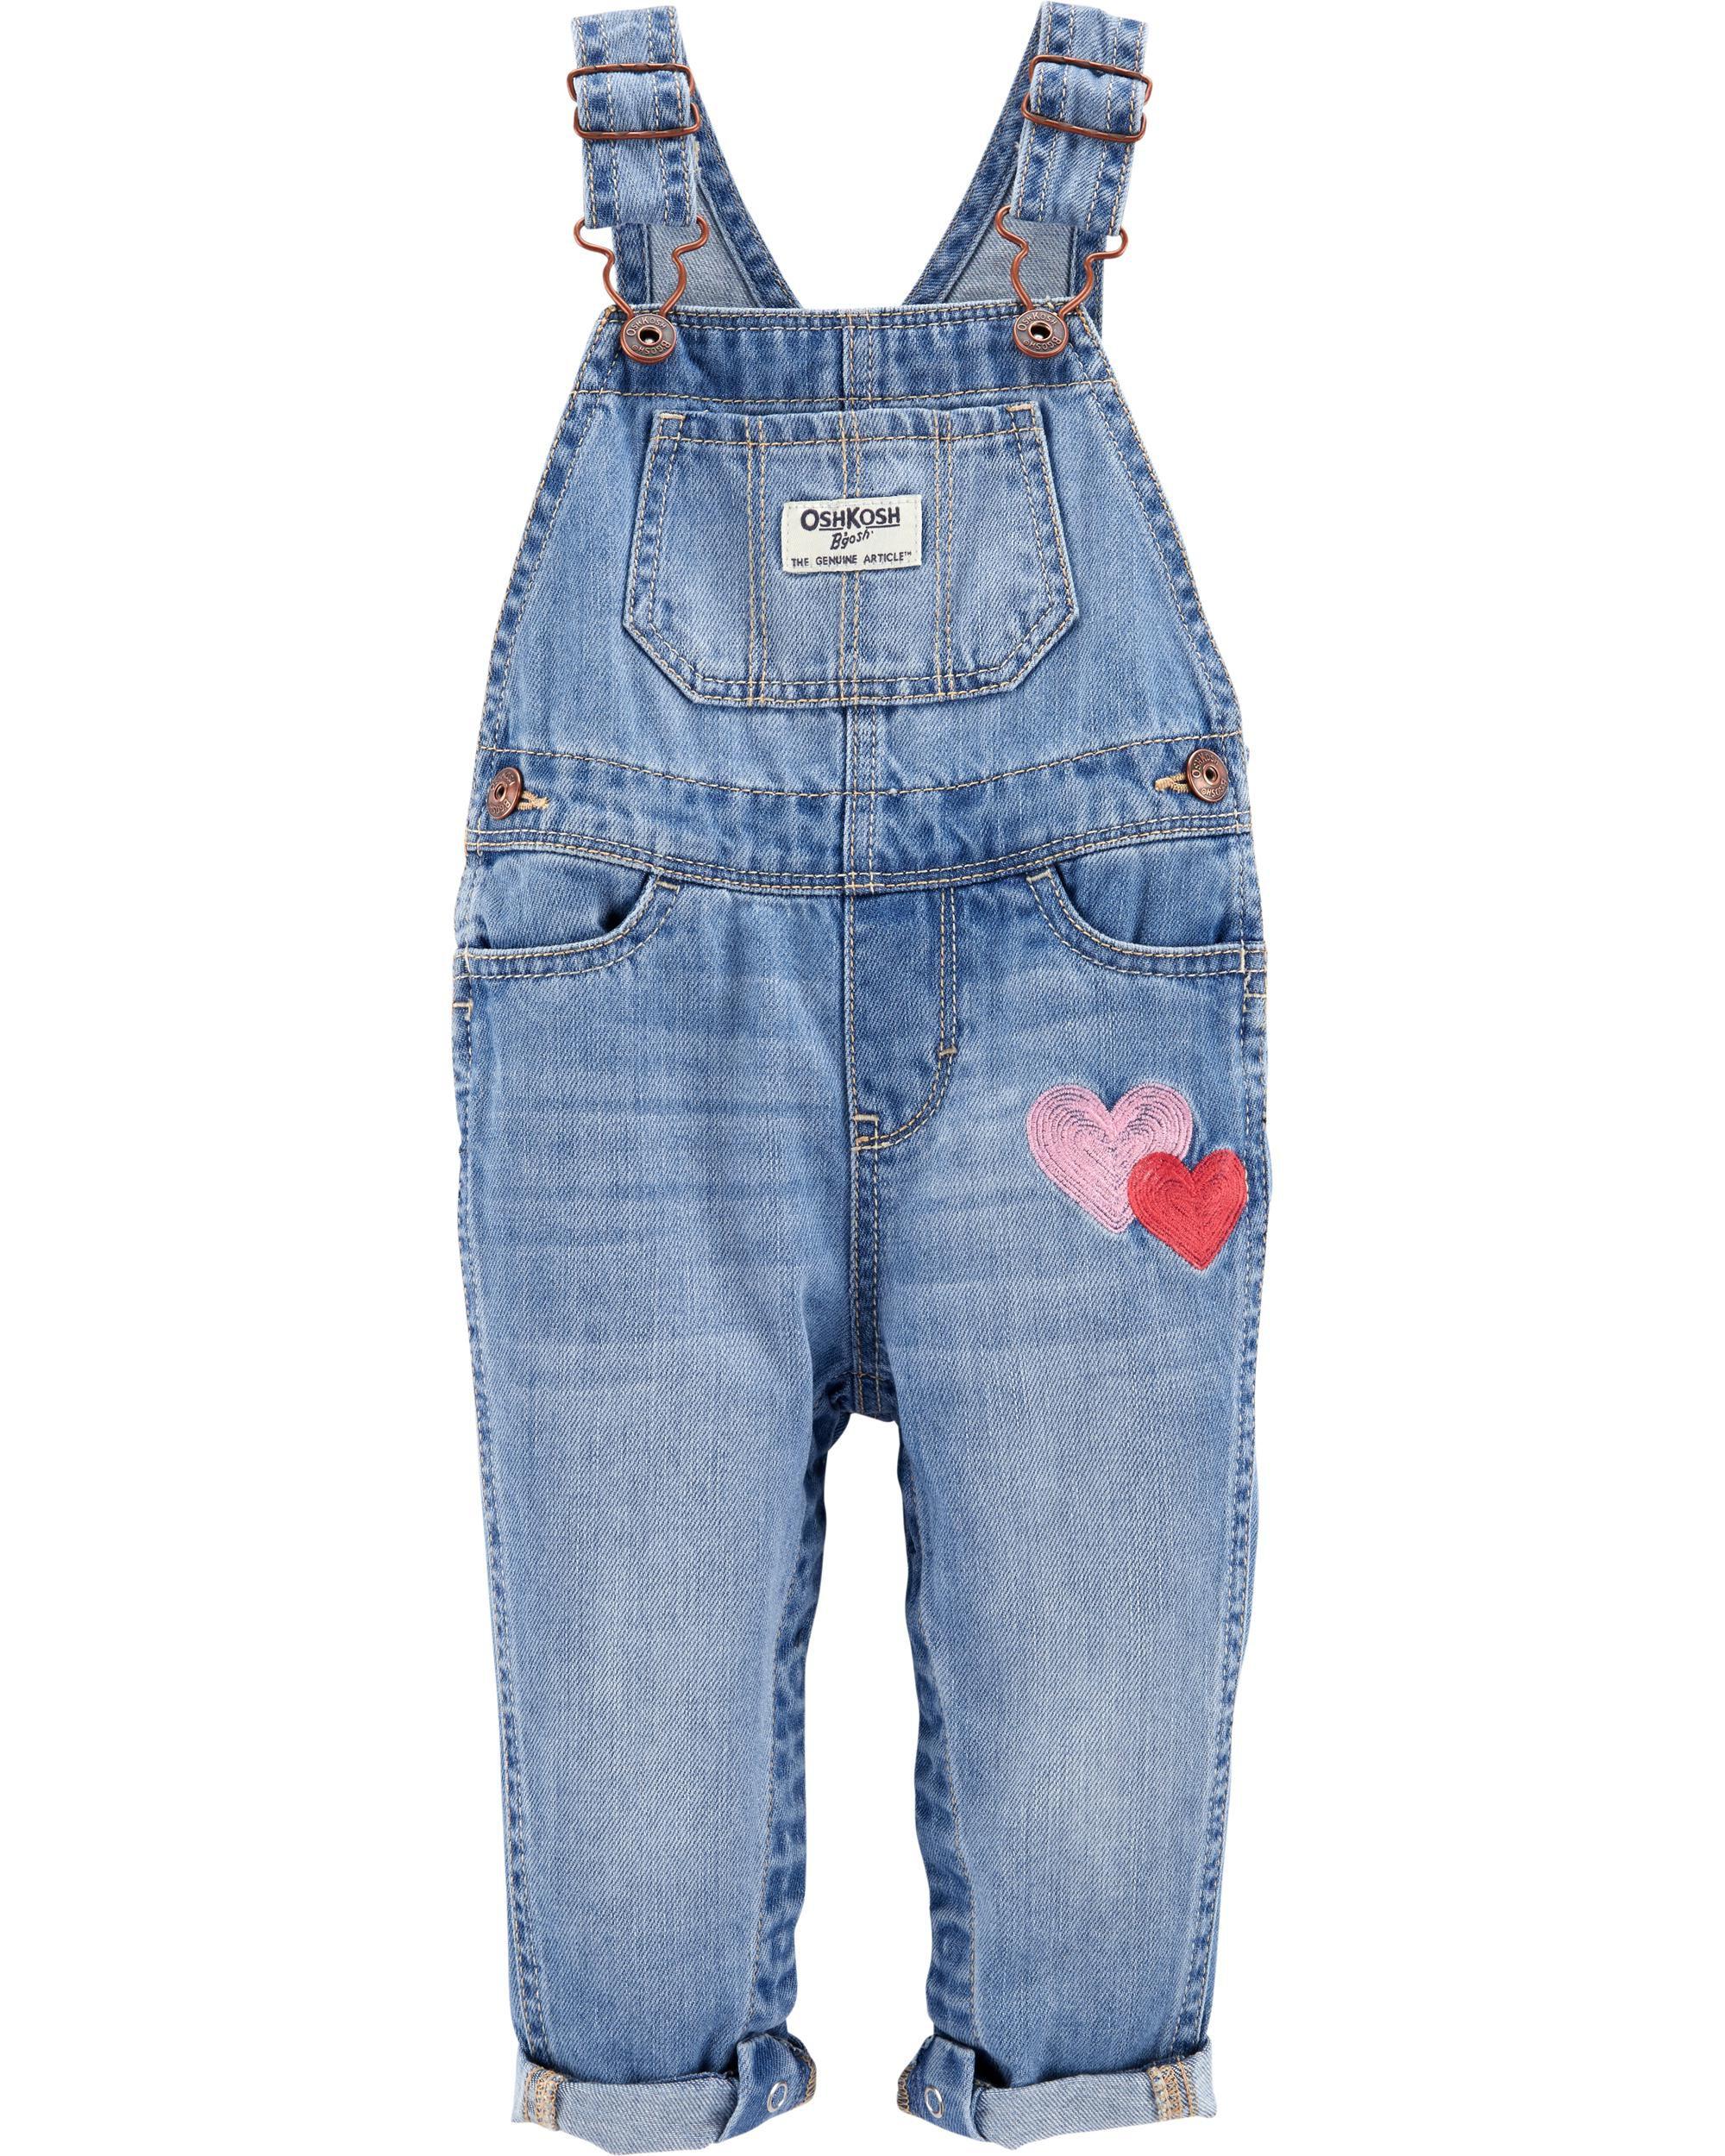 Floral-5 OshKosh Bgosh Floral Knit Leggings Toddler//Kid